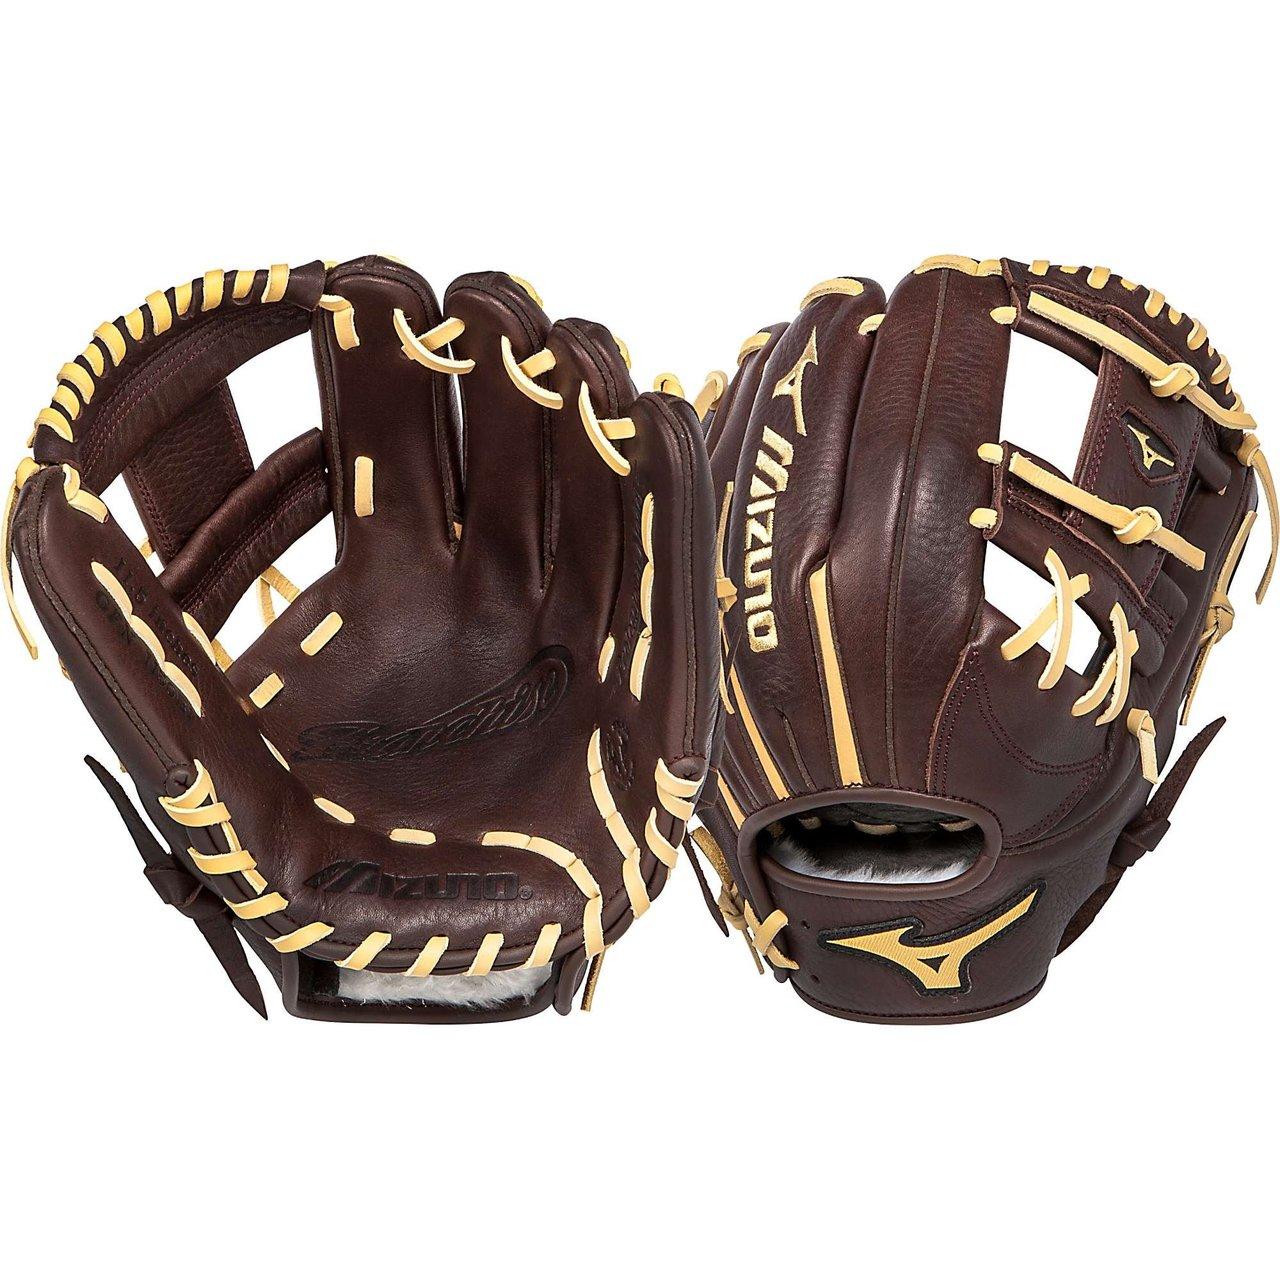 mizuno-franchise-series-gfn1150b1-baseball-glove-11-5-inch-right-handed-throw GFN1150B1-Right Handed Throw Mizuno New Mizuno Franchise Series GFN1150B1 Baseball Glove 11.5 inch Right Handed Throw